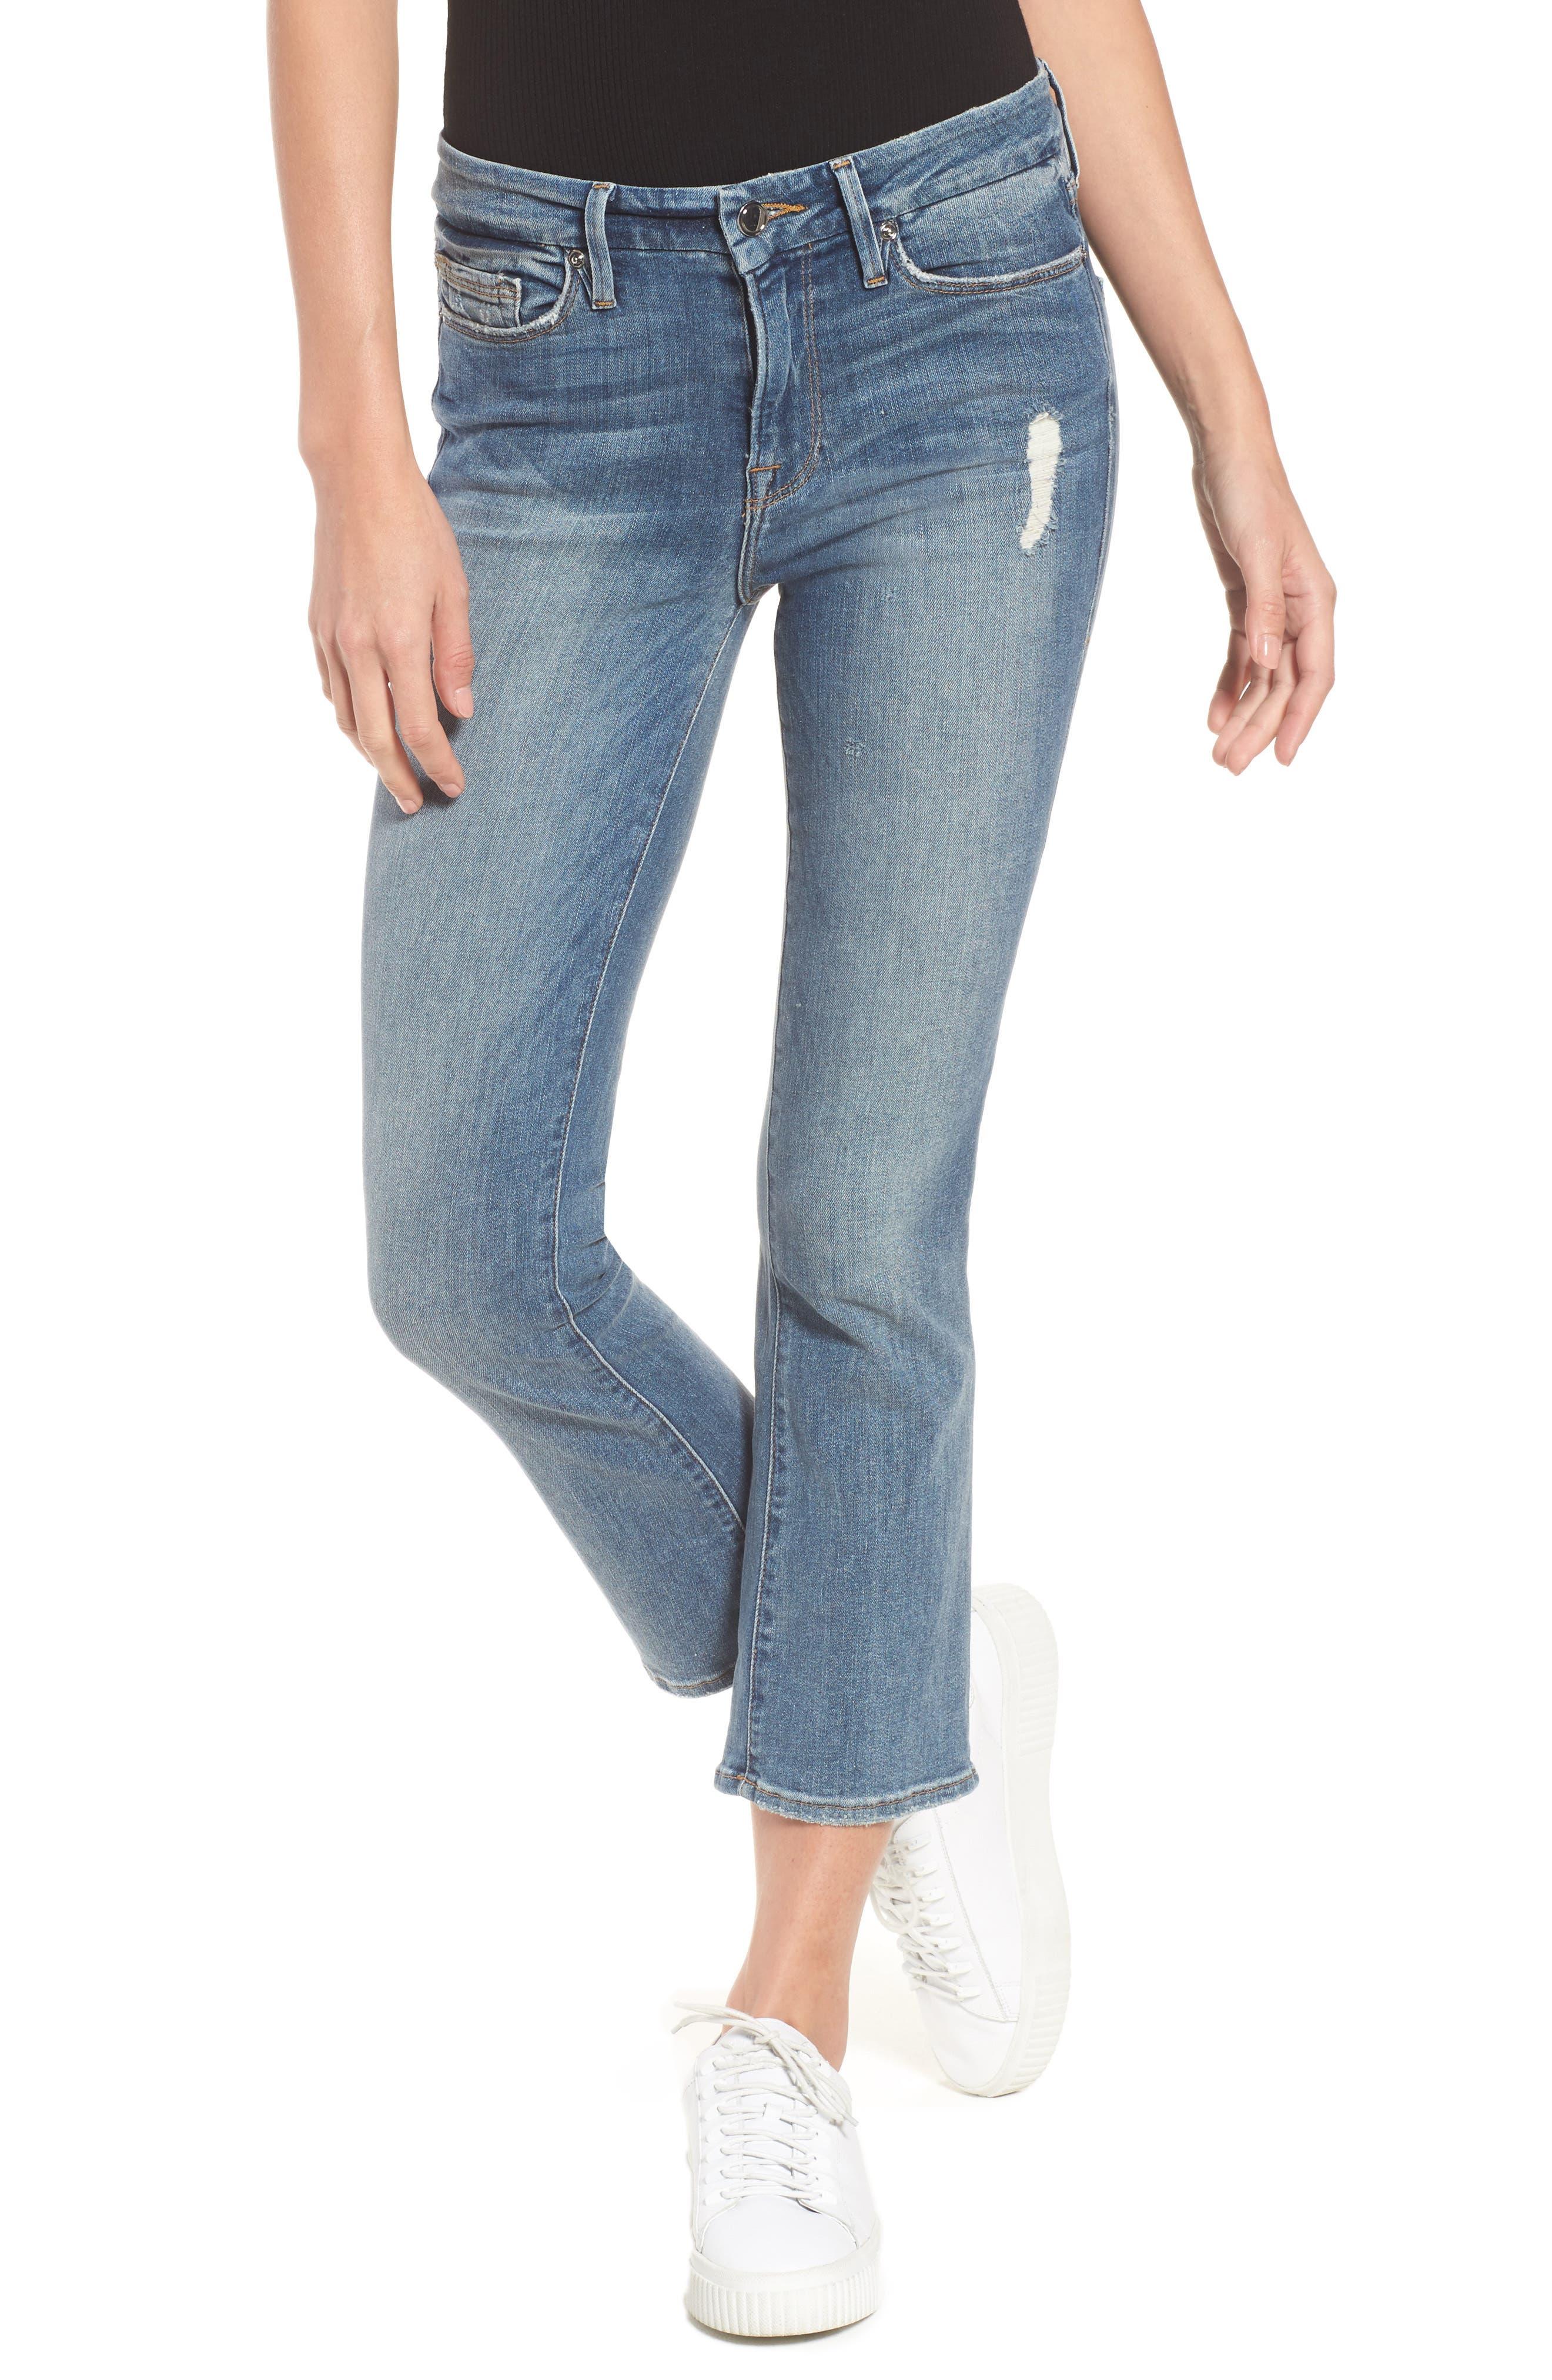 Good Cuts High Rise Boyfriend Jeans,                         Main,                         color, Blue 012